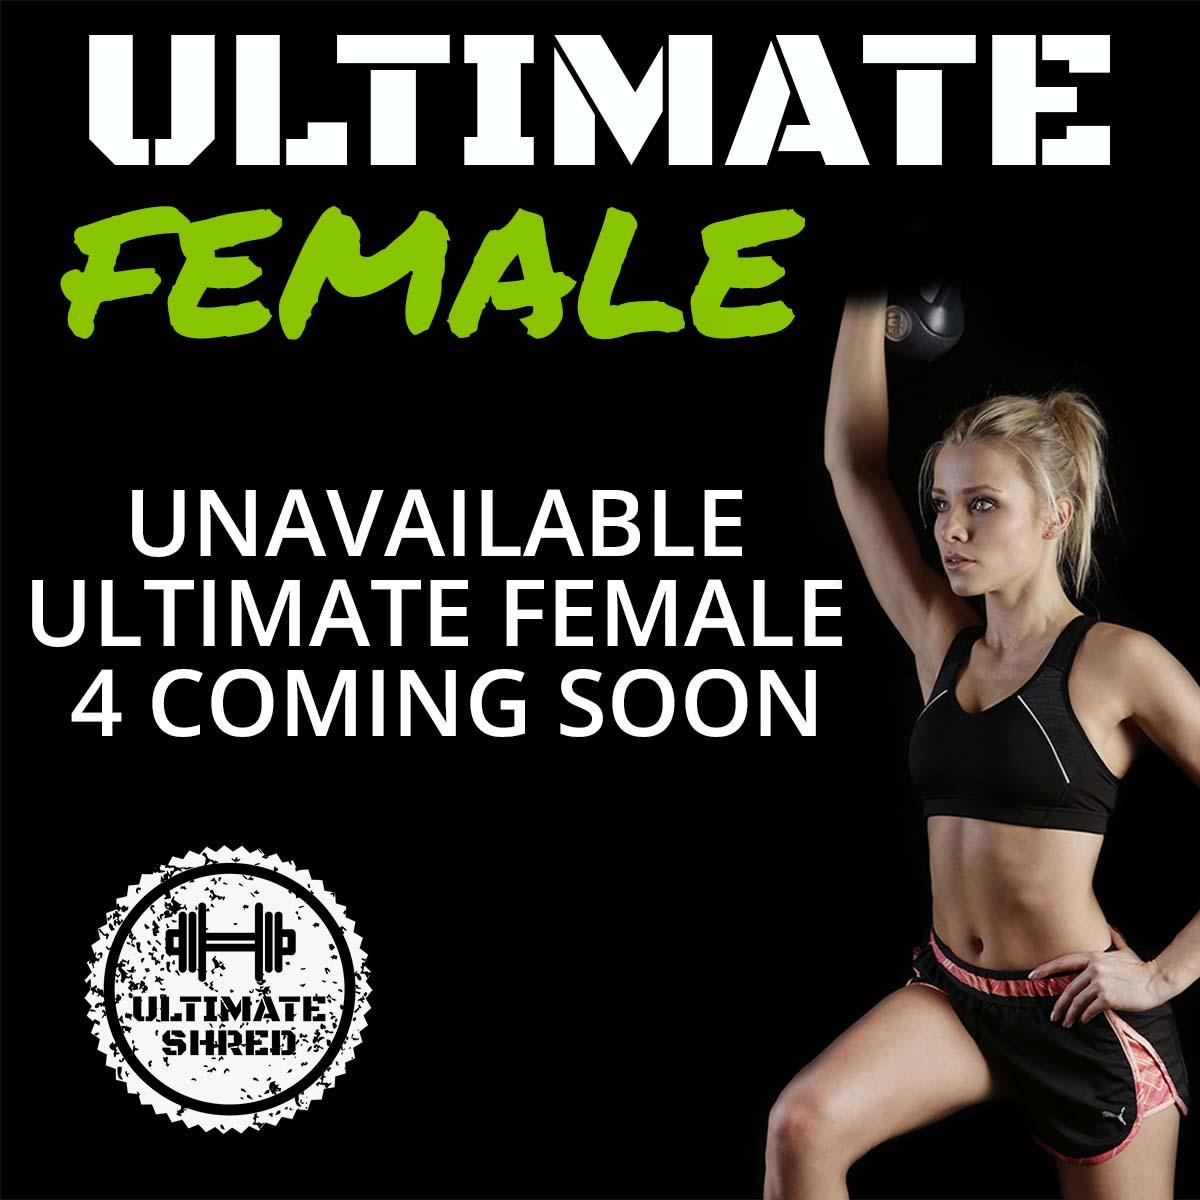 Ultimate Female 3